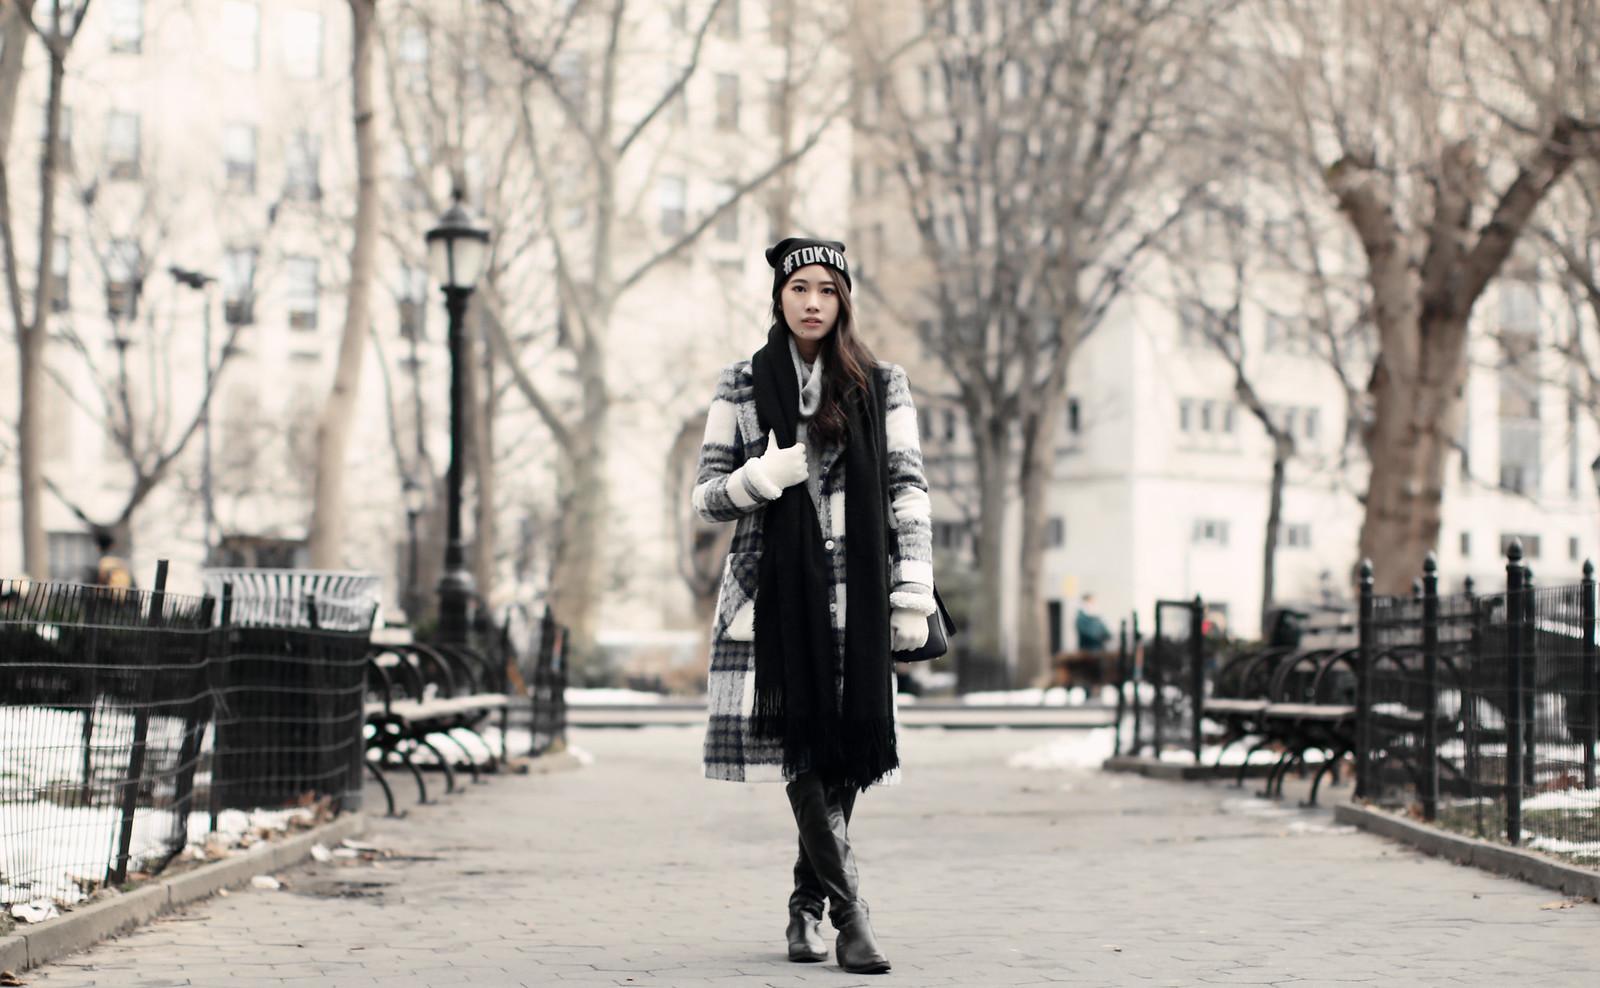 2061-clothestoyouuu-elizabeeetht-nyfw-newyorkfashionweek-nyc-fashionweek-newyork- winter2017-fashion-ootd